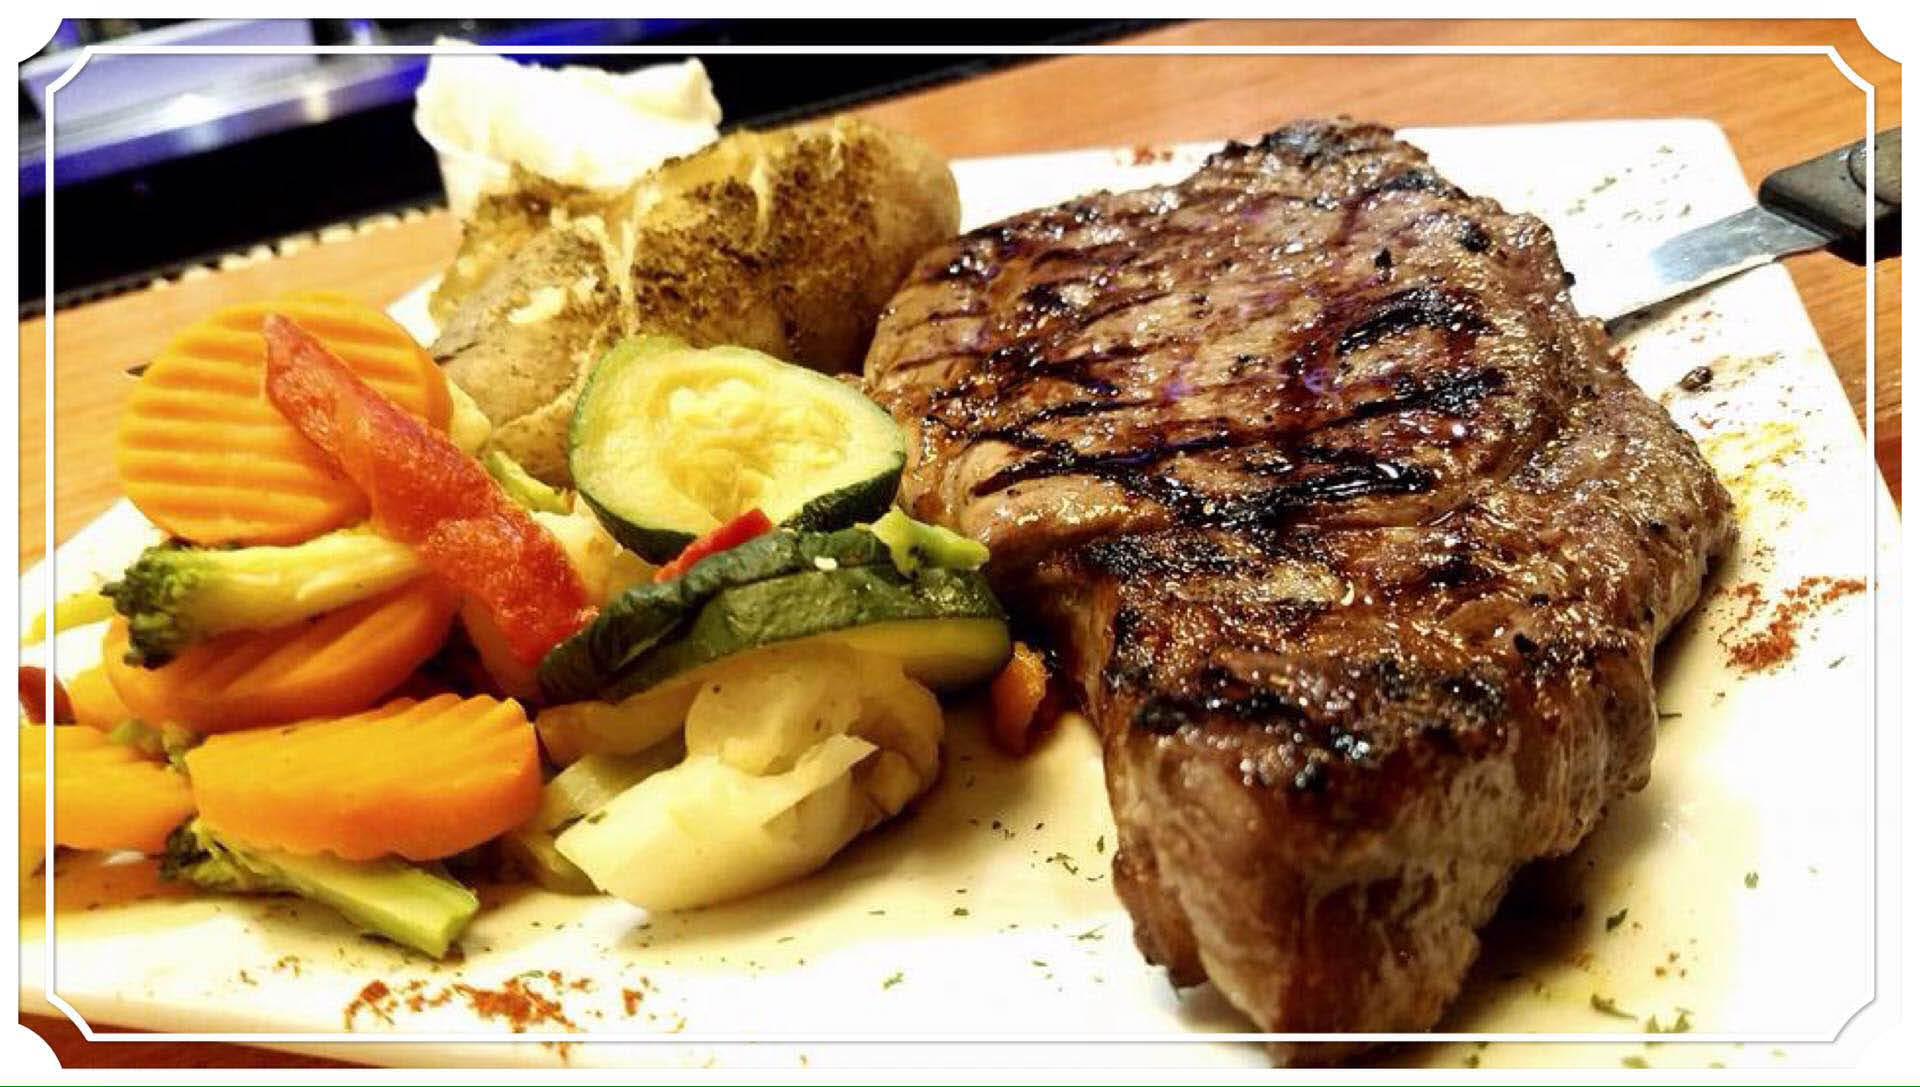 burgers,dinner,appetizers,steak,shrimp,bar food,pub food,station ale house,dinner near me,dinner in 21901,restaurant in 21901